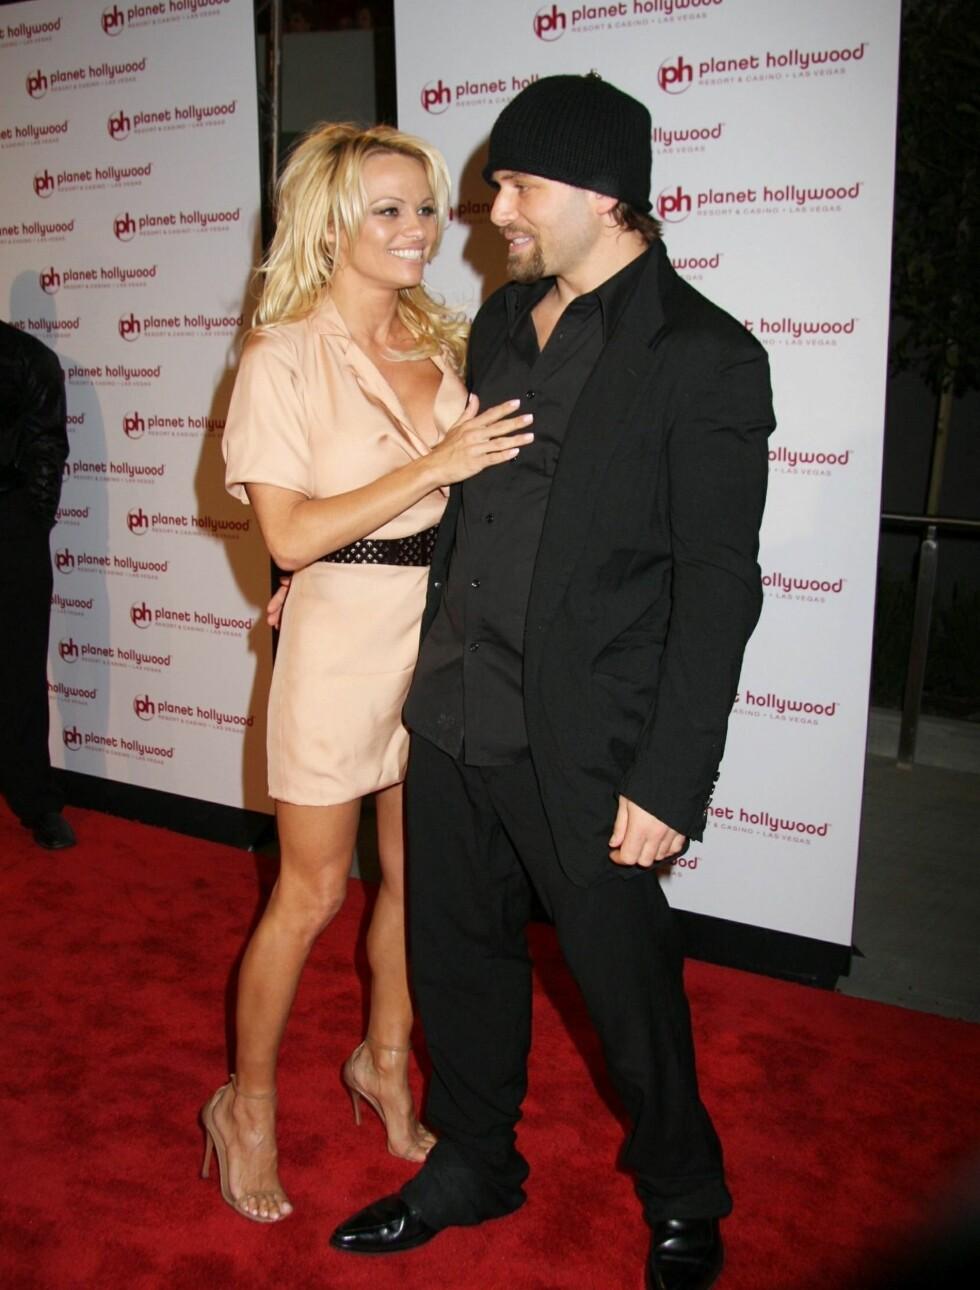 KORT: Pamela Anderson giftet seg med filmproduser og gambler Rick Salomon i 2008. Bedrageri var hovedgrunnen for den kortvarige affæren.  Foto: STELLA PICTURES